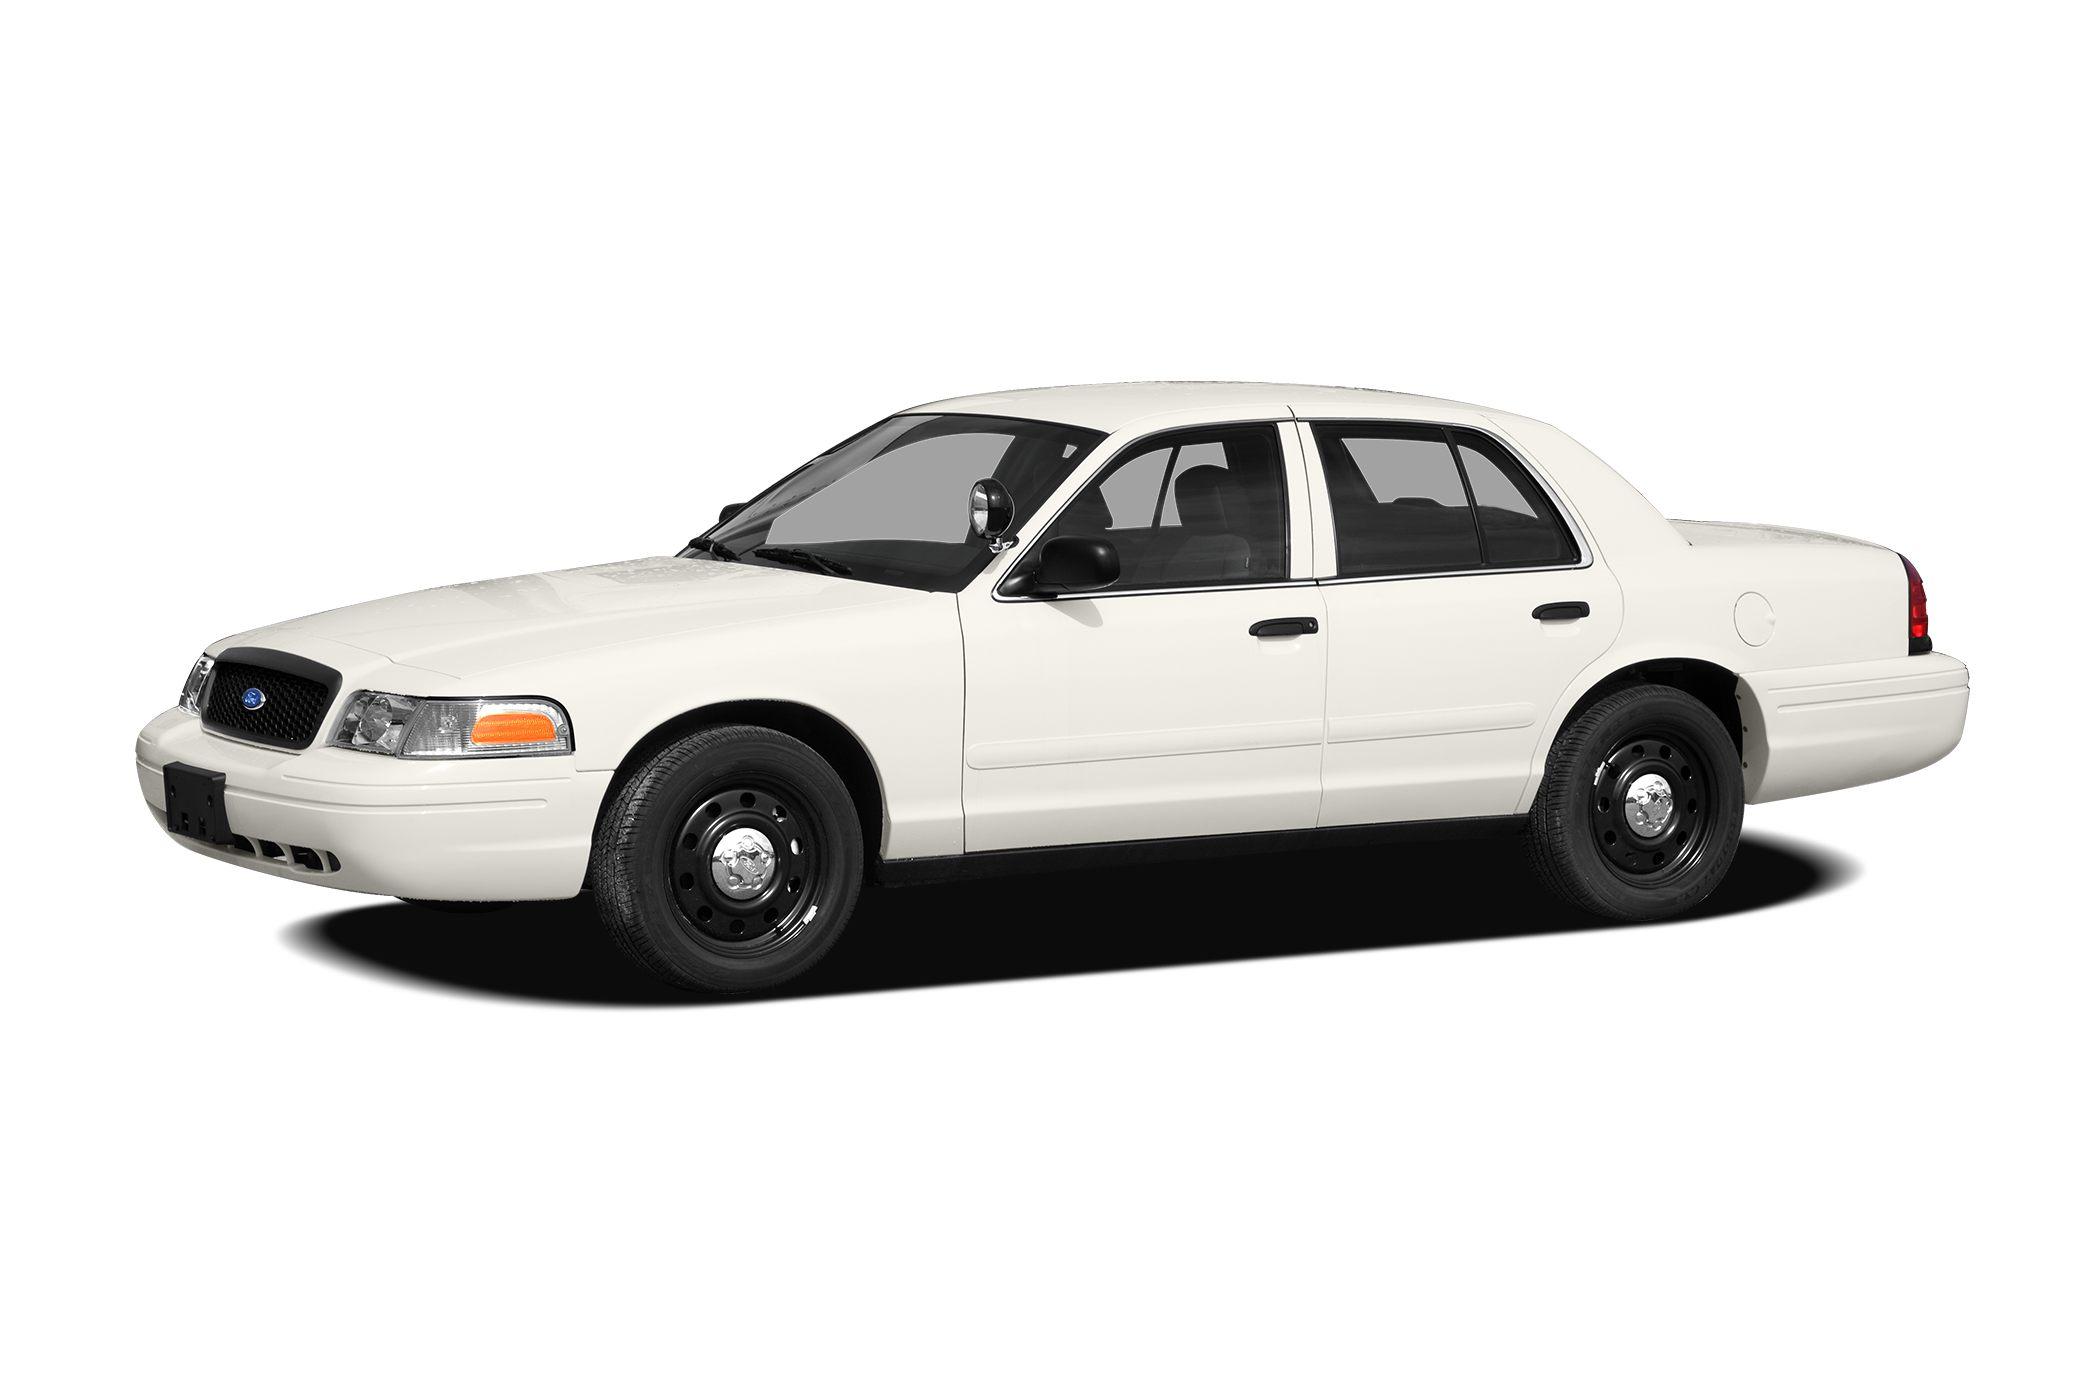 2008 Ford Crown Victoria Police Interceptor  Miles 121110Color Black Stock 0842630 VIN 2FA